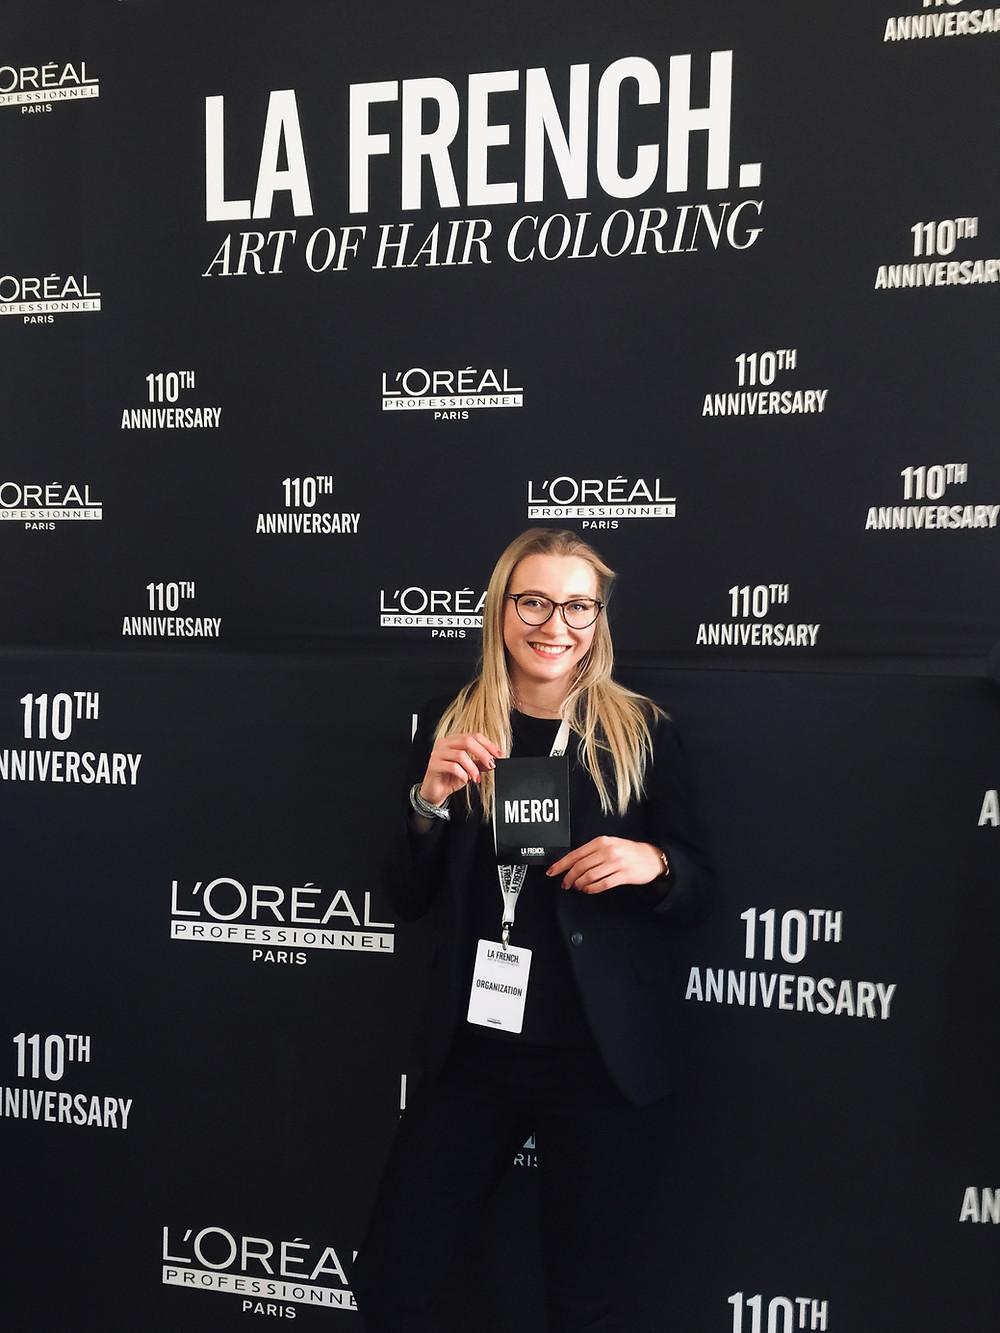 Aleks at L'Oréal 110 anniversary in Paris - La French.Art of Hair Coloring